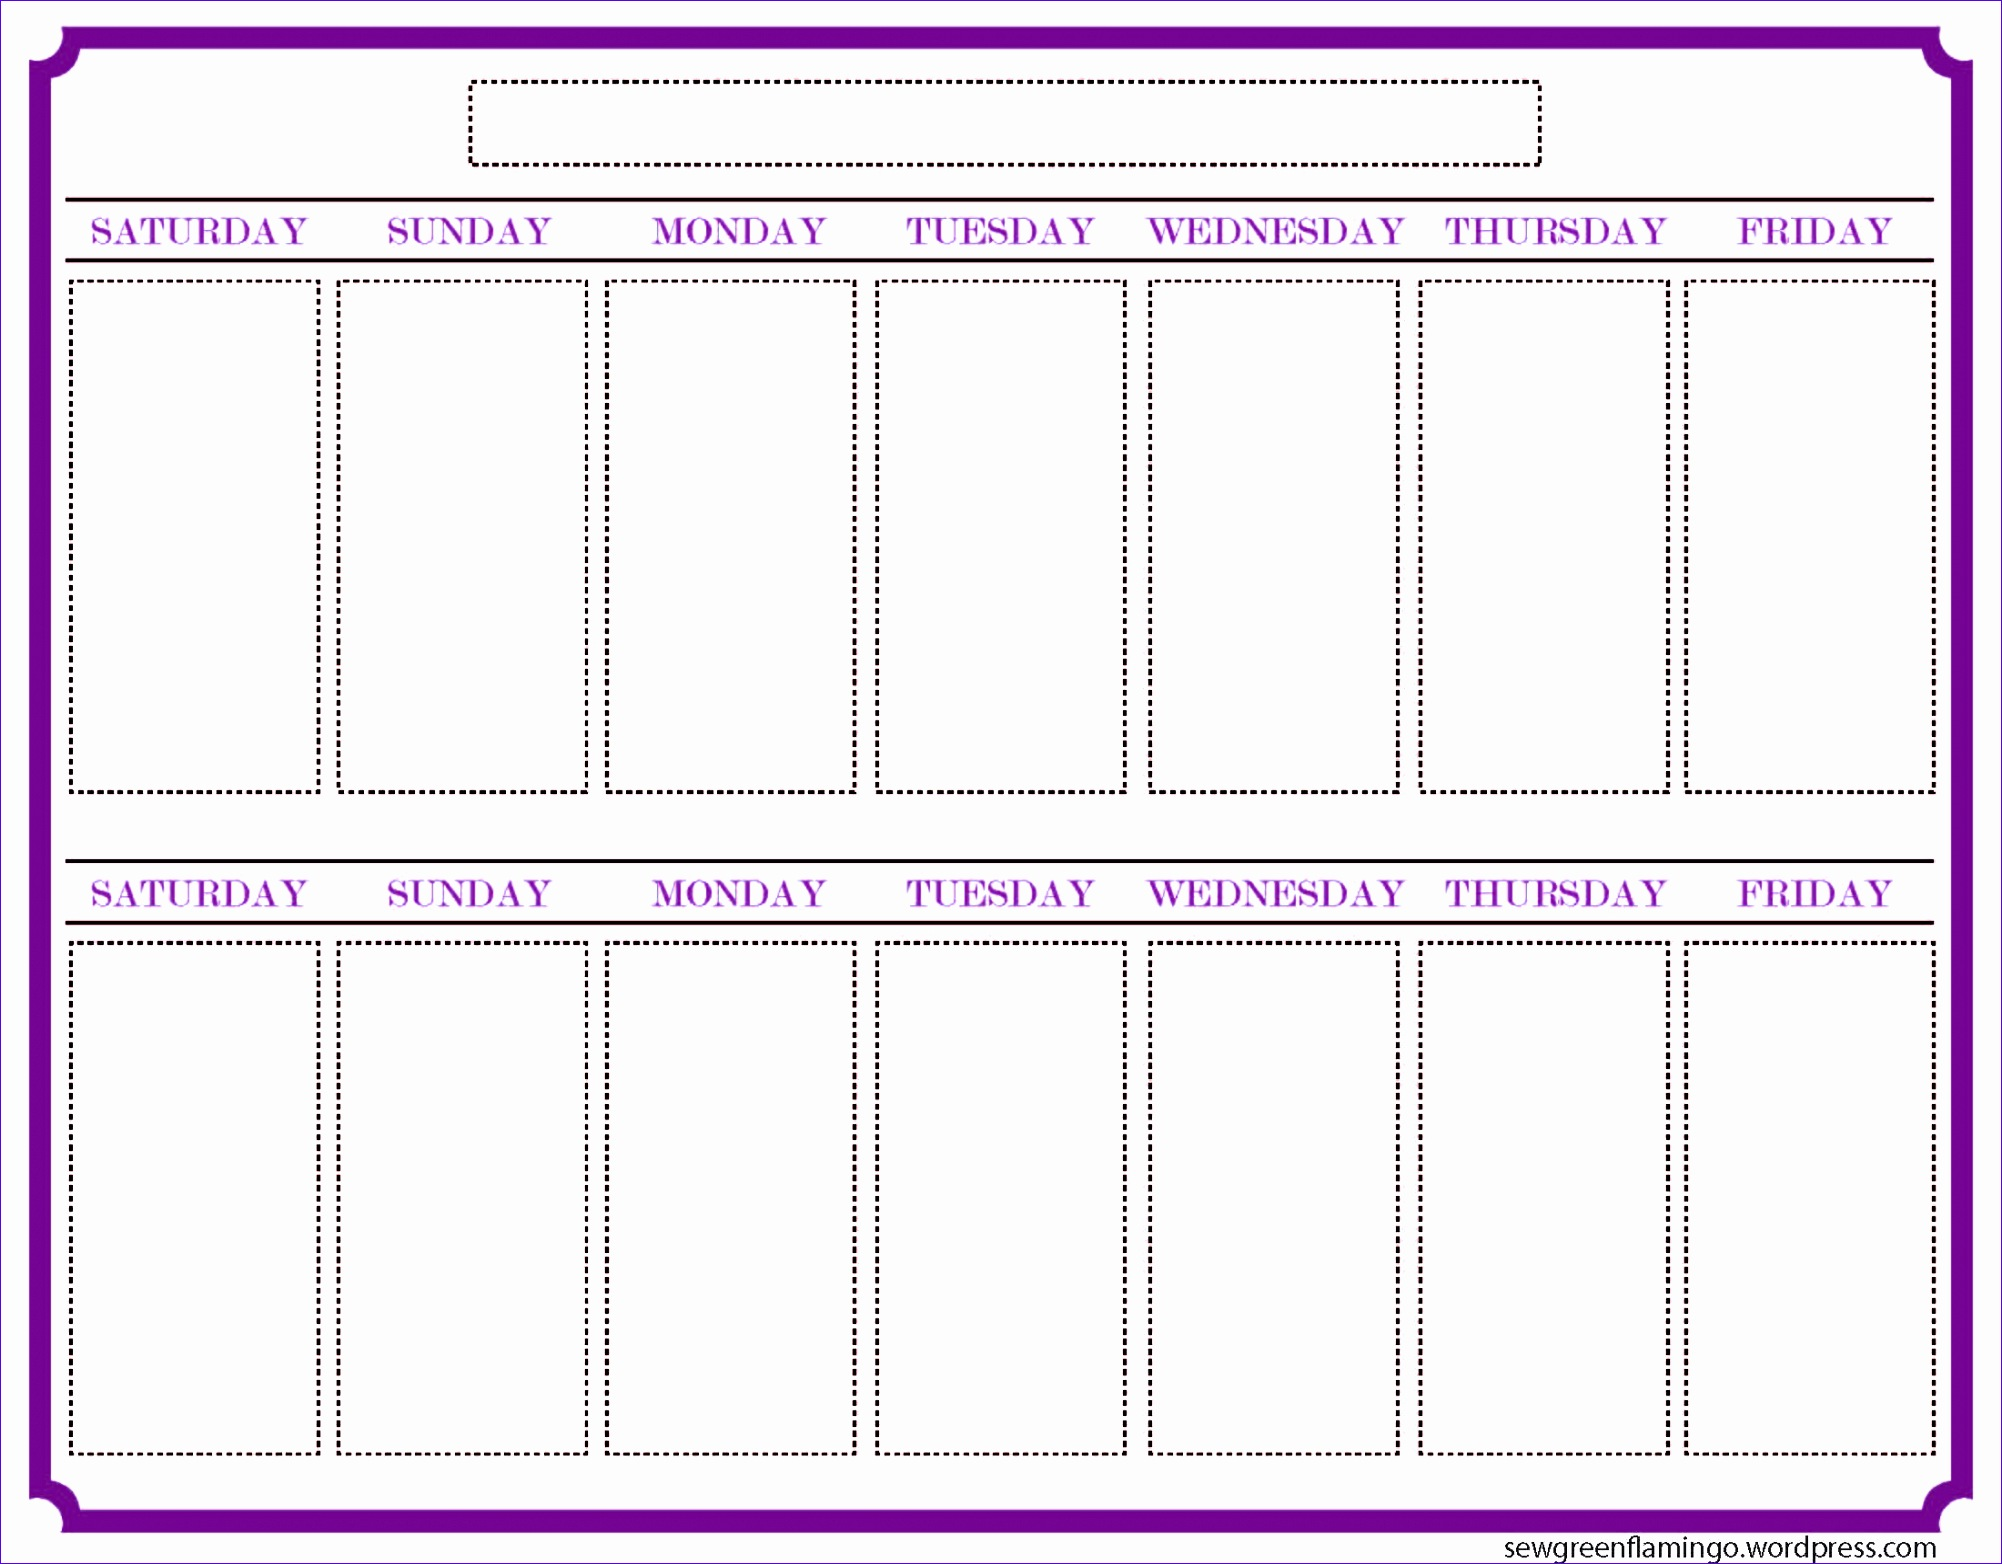 calendar timetable template 20021564